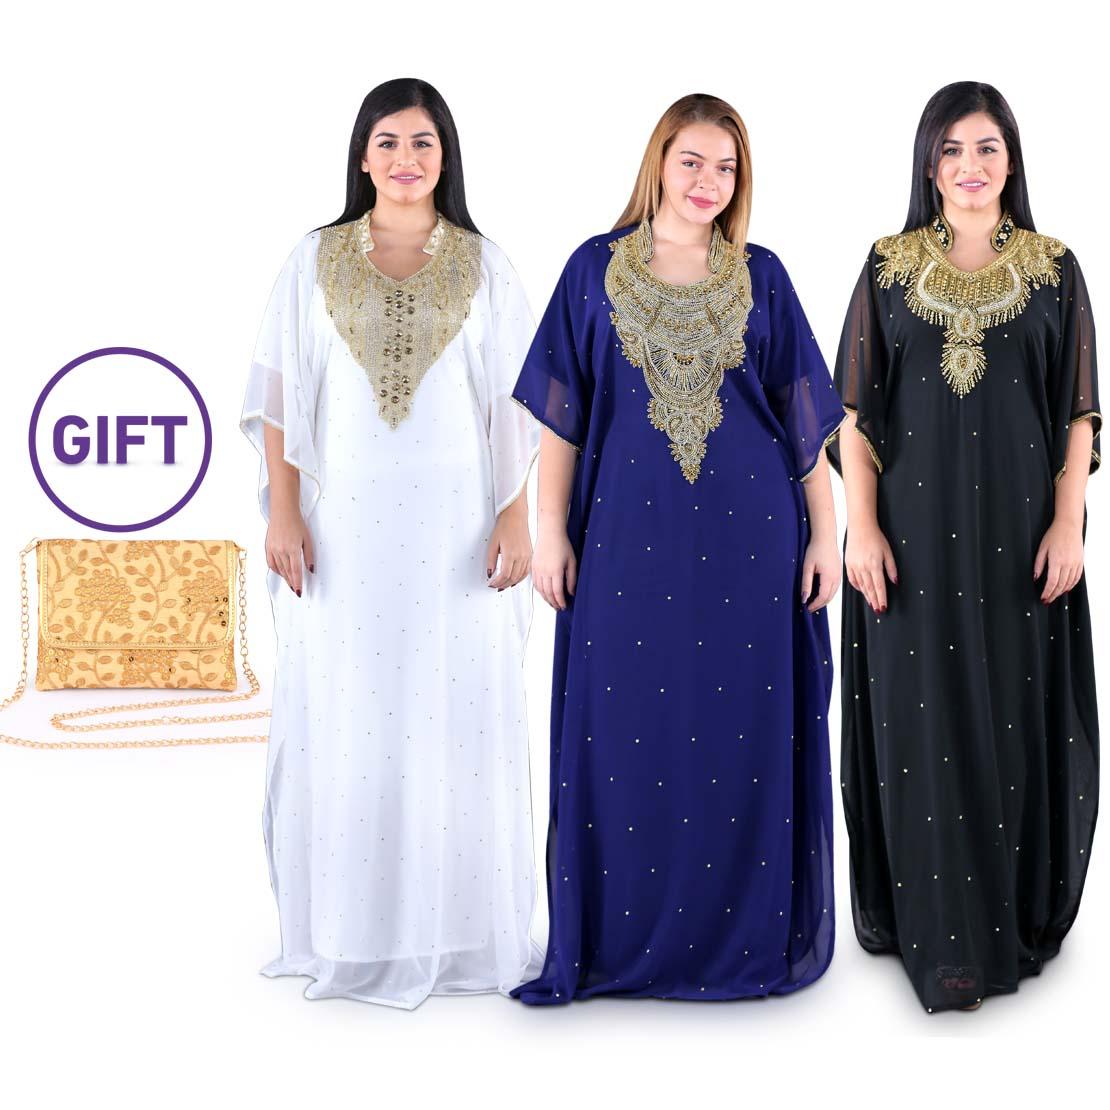 Mahra Embellished Jalabiyas - Pack of 3